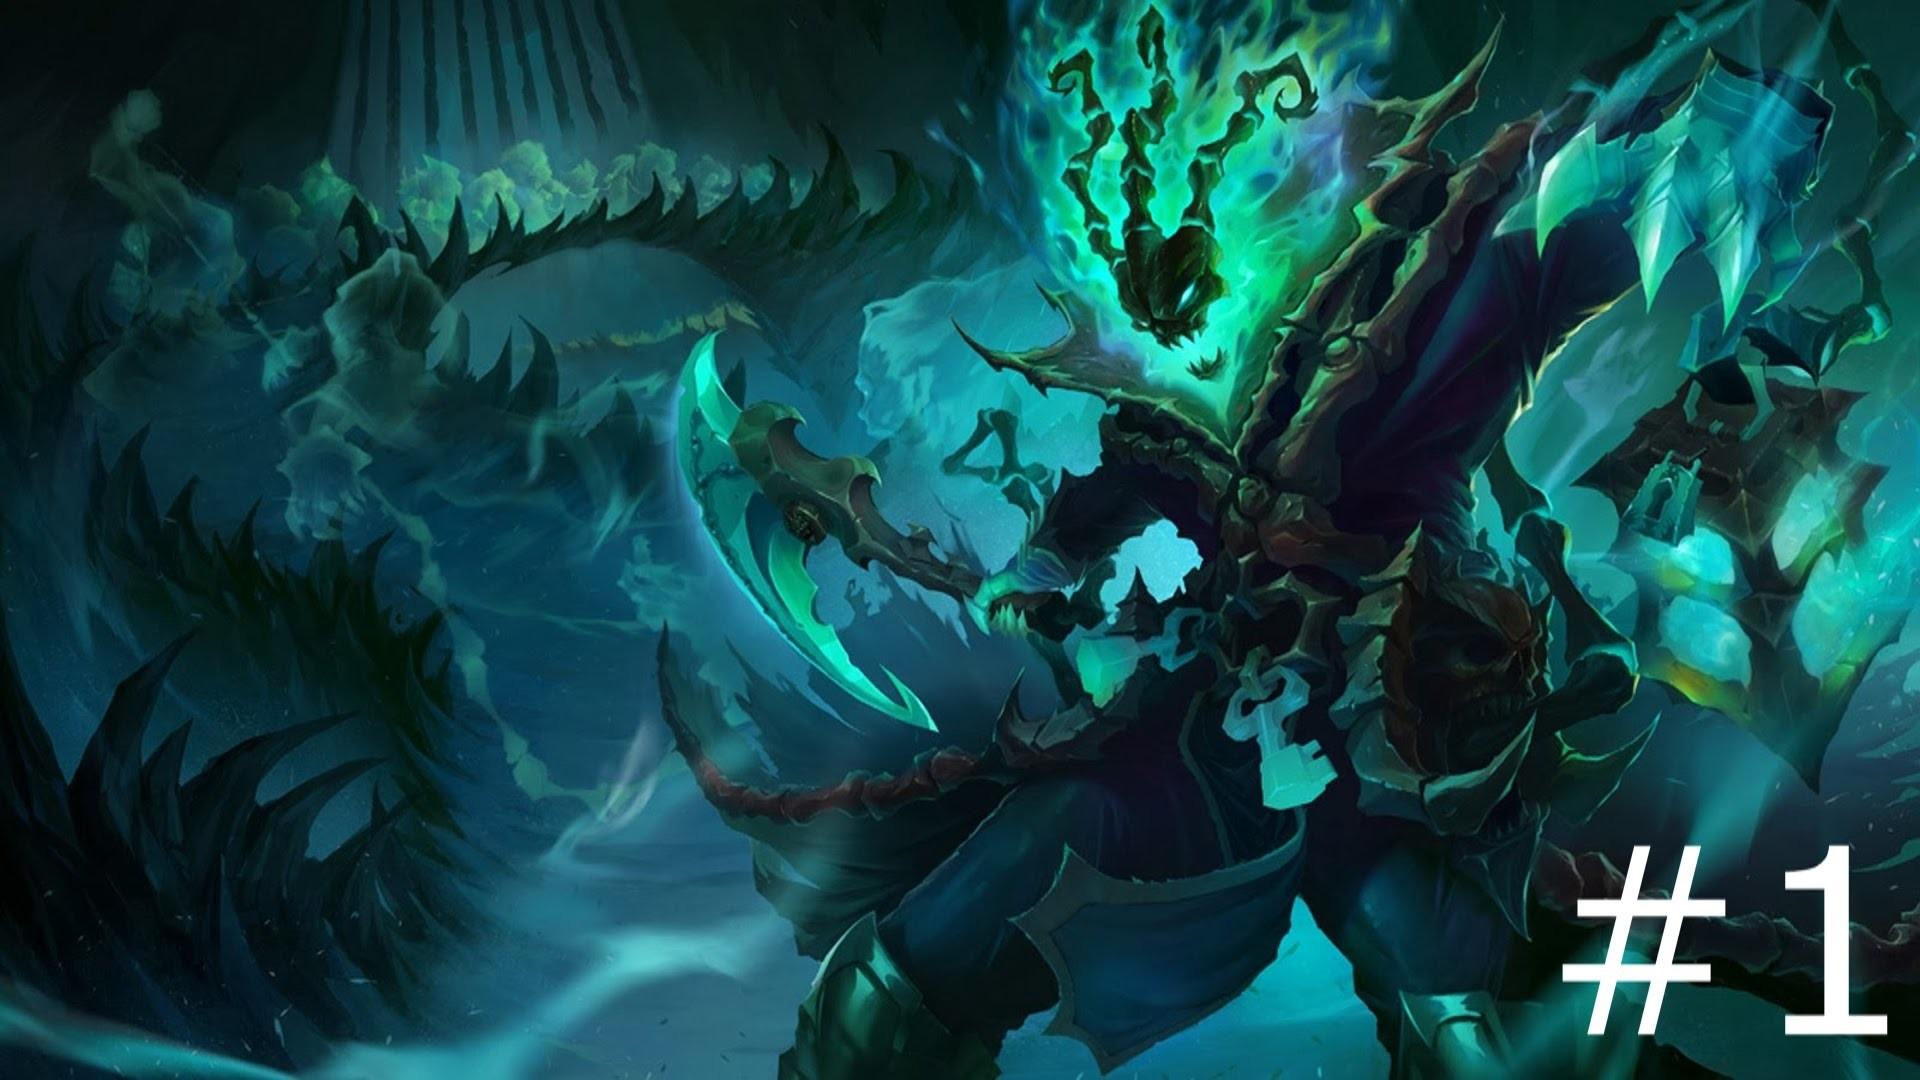 Nami League Of Legends Champions Thresh Update Wallpaper